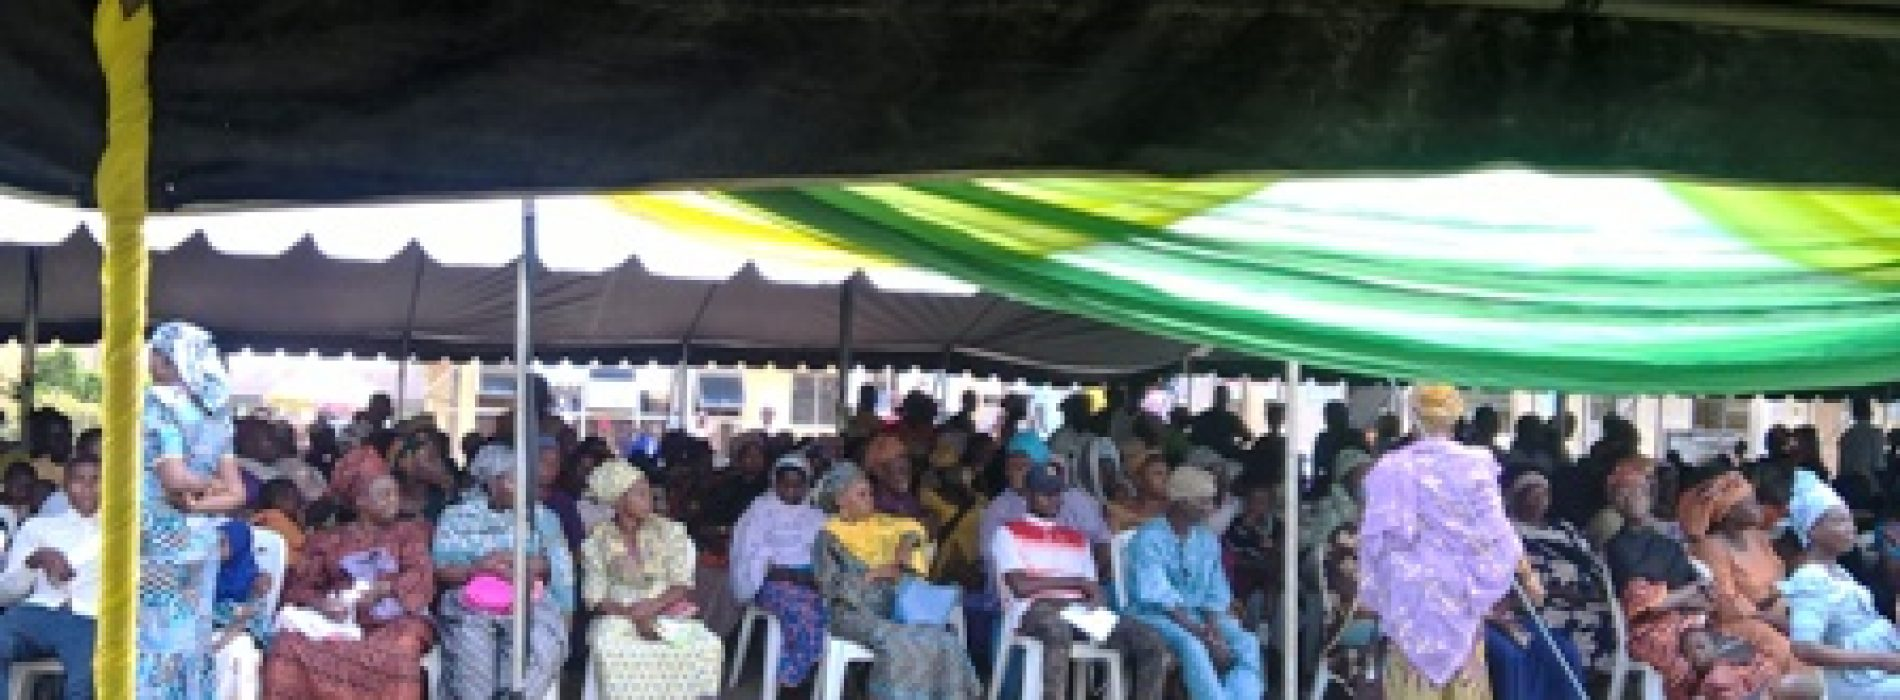 Eko Health Mission storms Epe